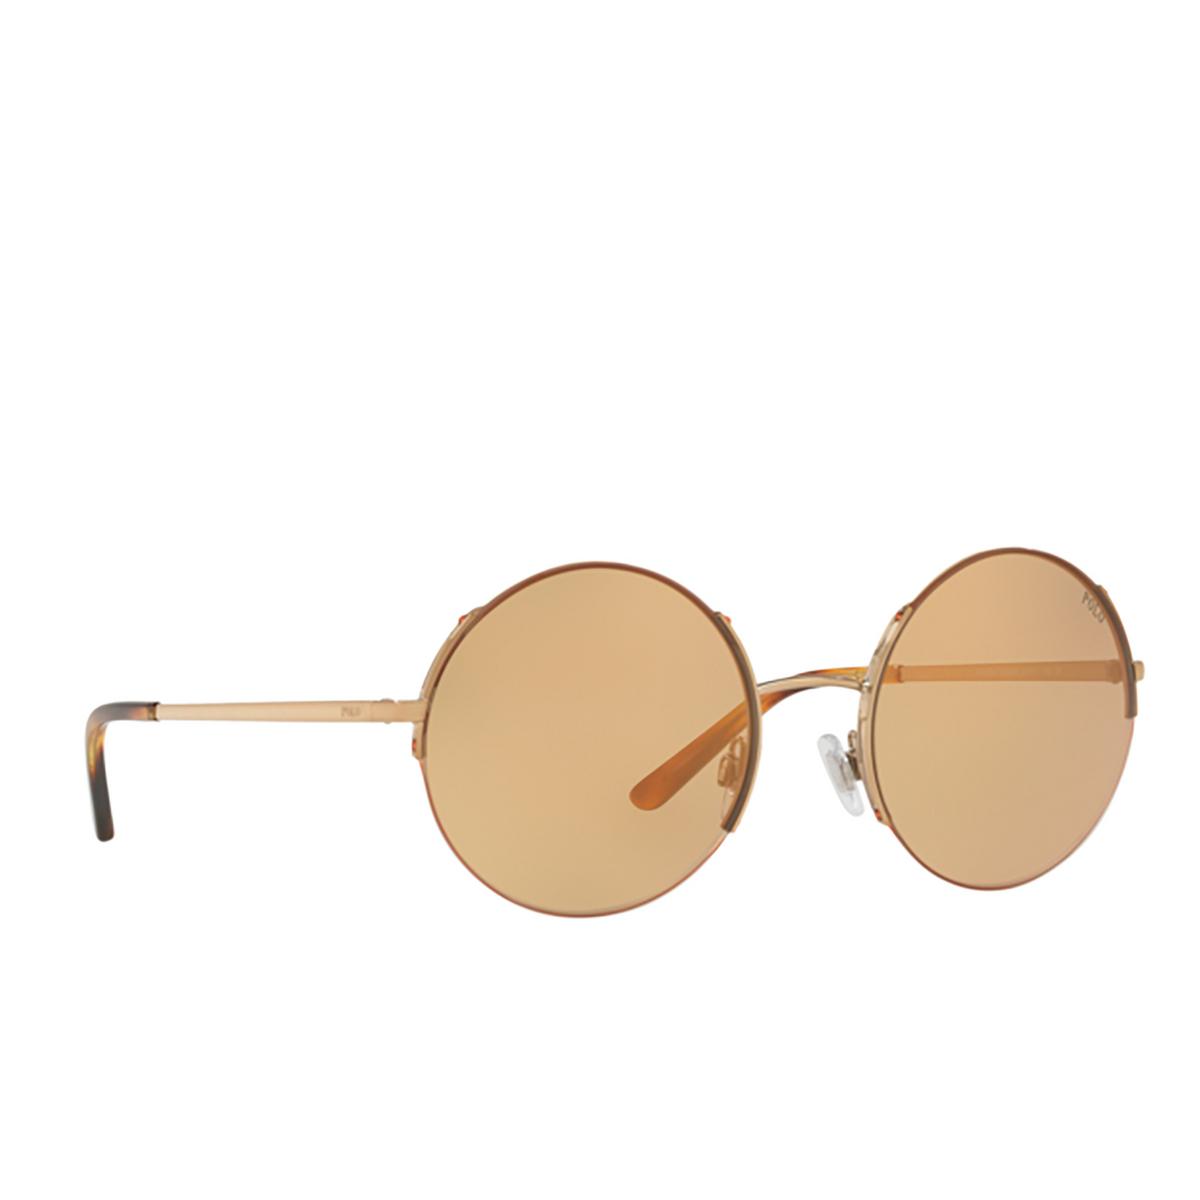 Polo Ralph Lauren® Round Sunglasses: PH3120 color Shiny Rose Gold 9334R1.